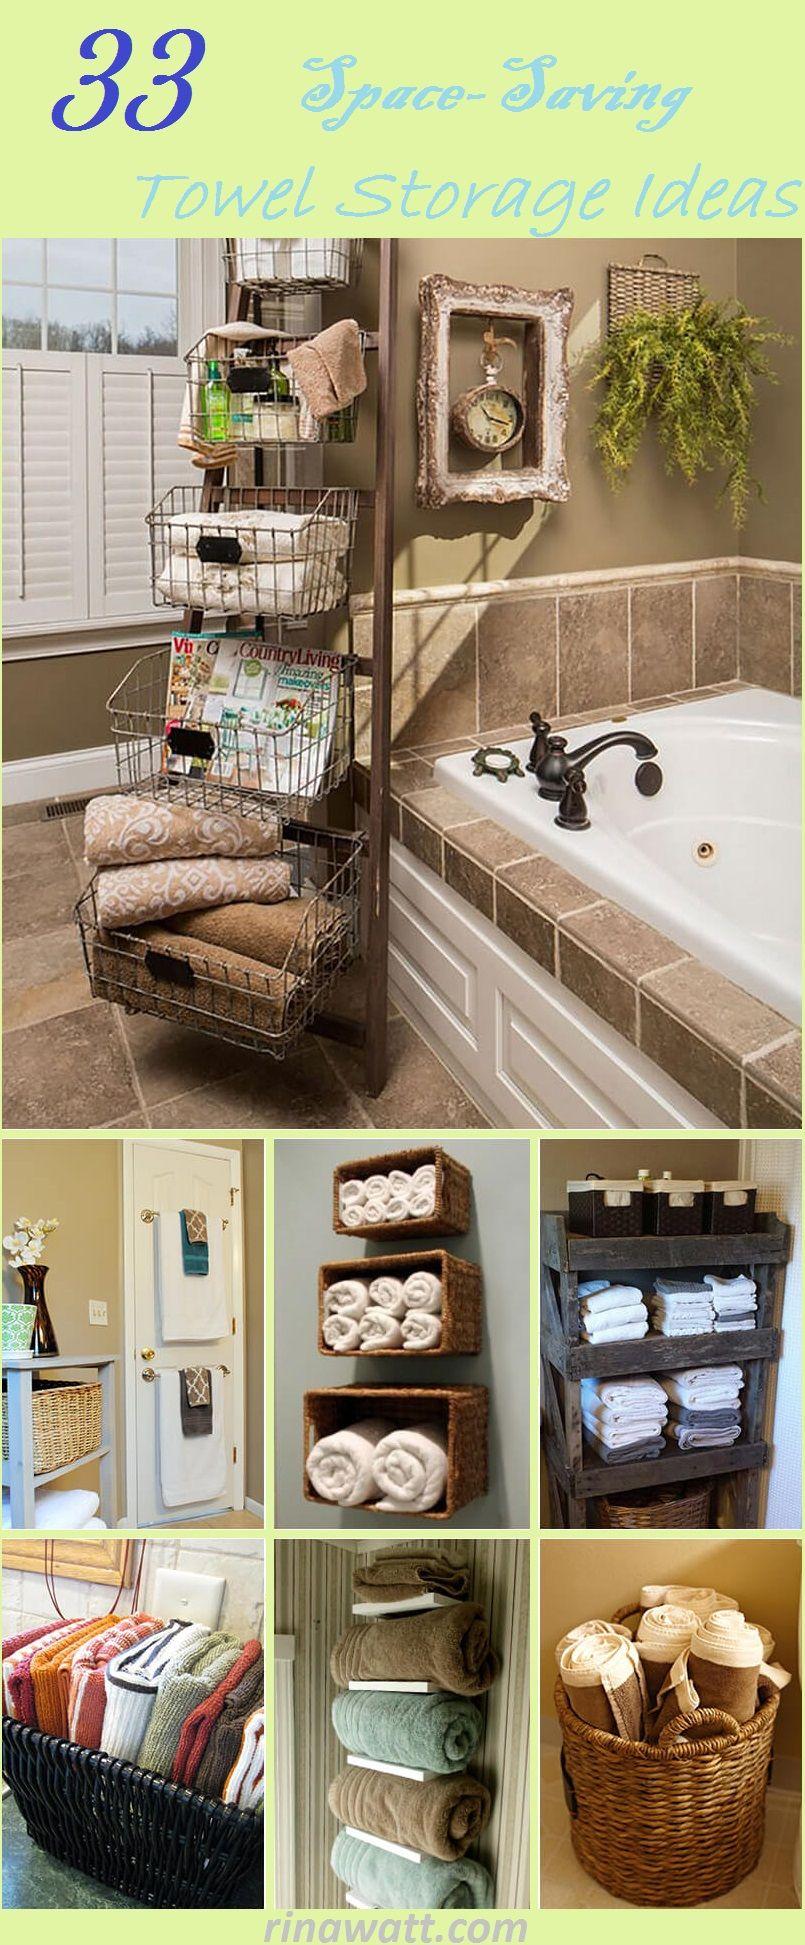 33 Space Saving Towel Storage Ideas For Your Bathroom Industrial Bathroom Design Industrial Style Bathroom Towel Storage